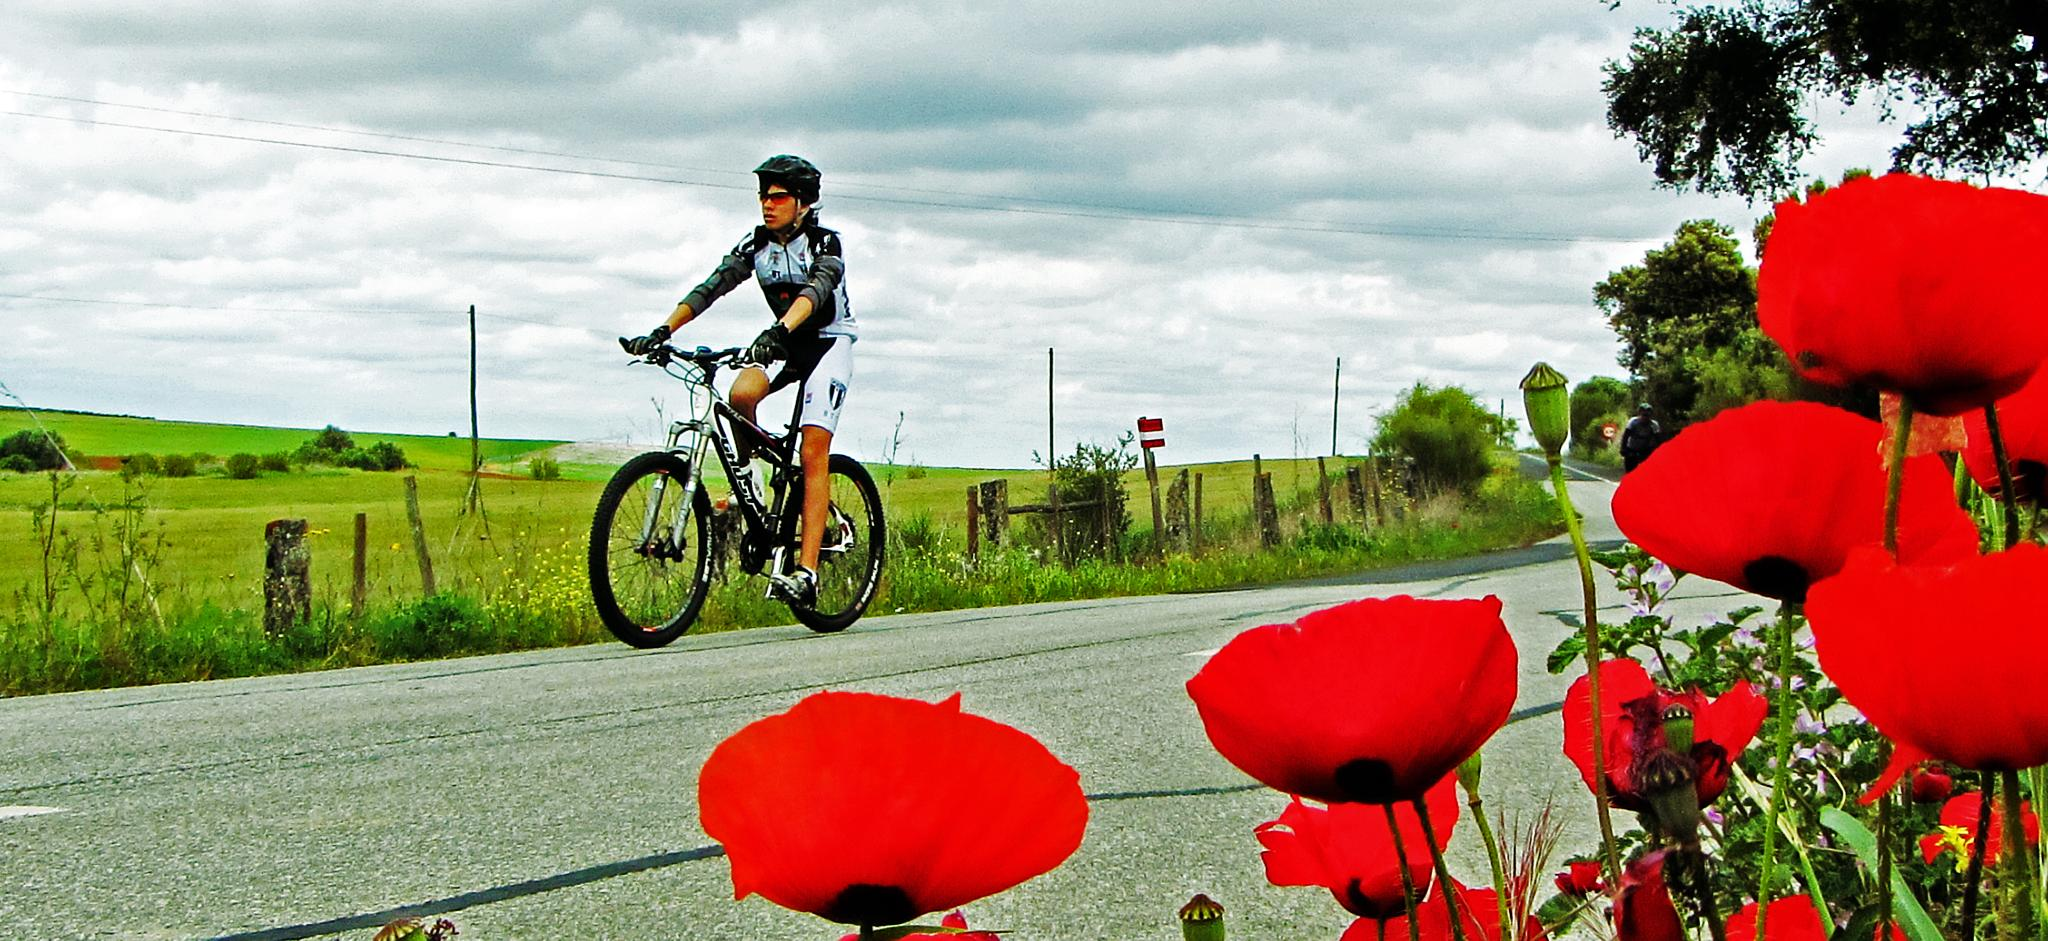 The cyclist by antoniojppereira